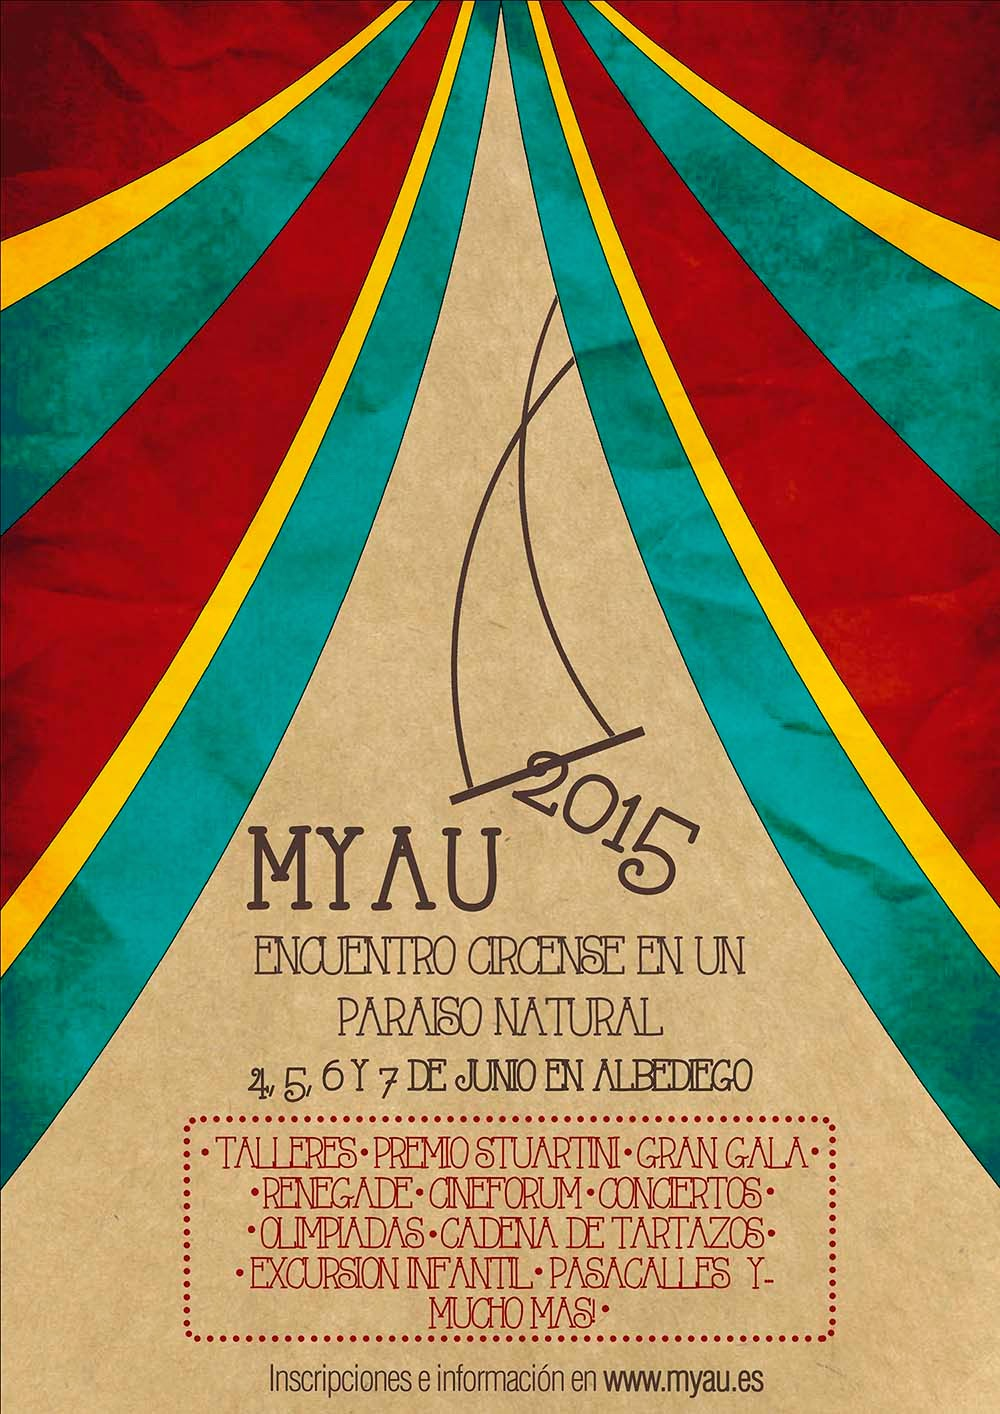 Foto del cartel ganador del 2º Premio concurso de carteles MYAU 2015 de Flor Vazquez